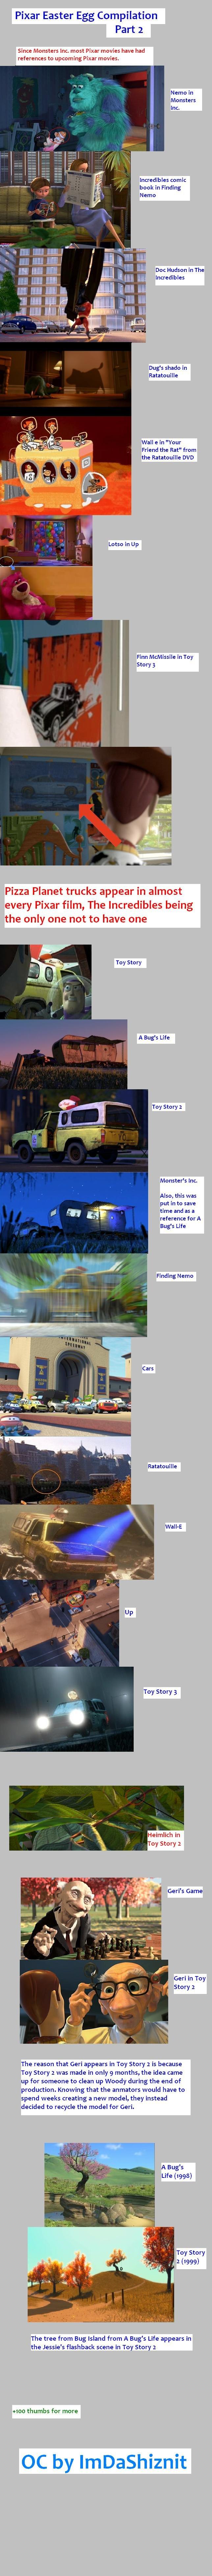 Pixar Easter Egg Comp. Part 2. Part 1: /funny_pictures/2562135/Another+stoned+story/ Part 3: /funny_pictures/2564722/Pixar+Easter+Egg+Comp+Part+3/. Pixar Easter pixar Easter egg Disney hidden cool